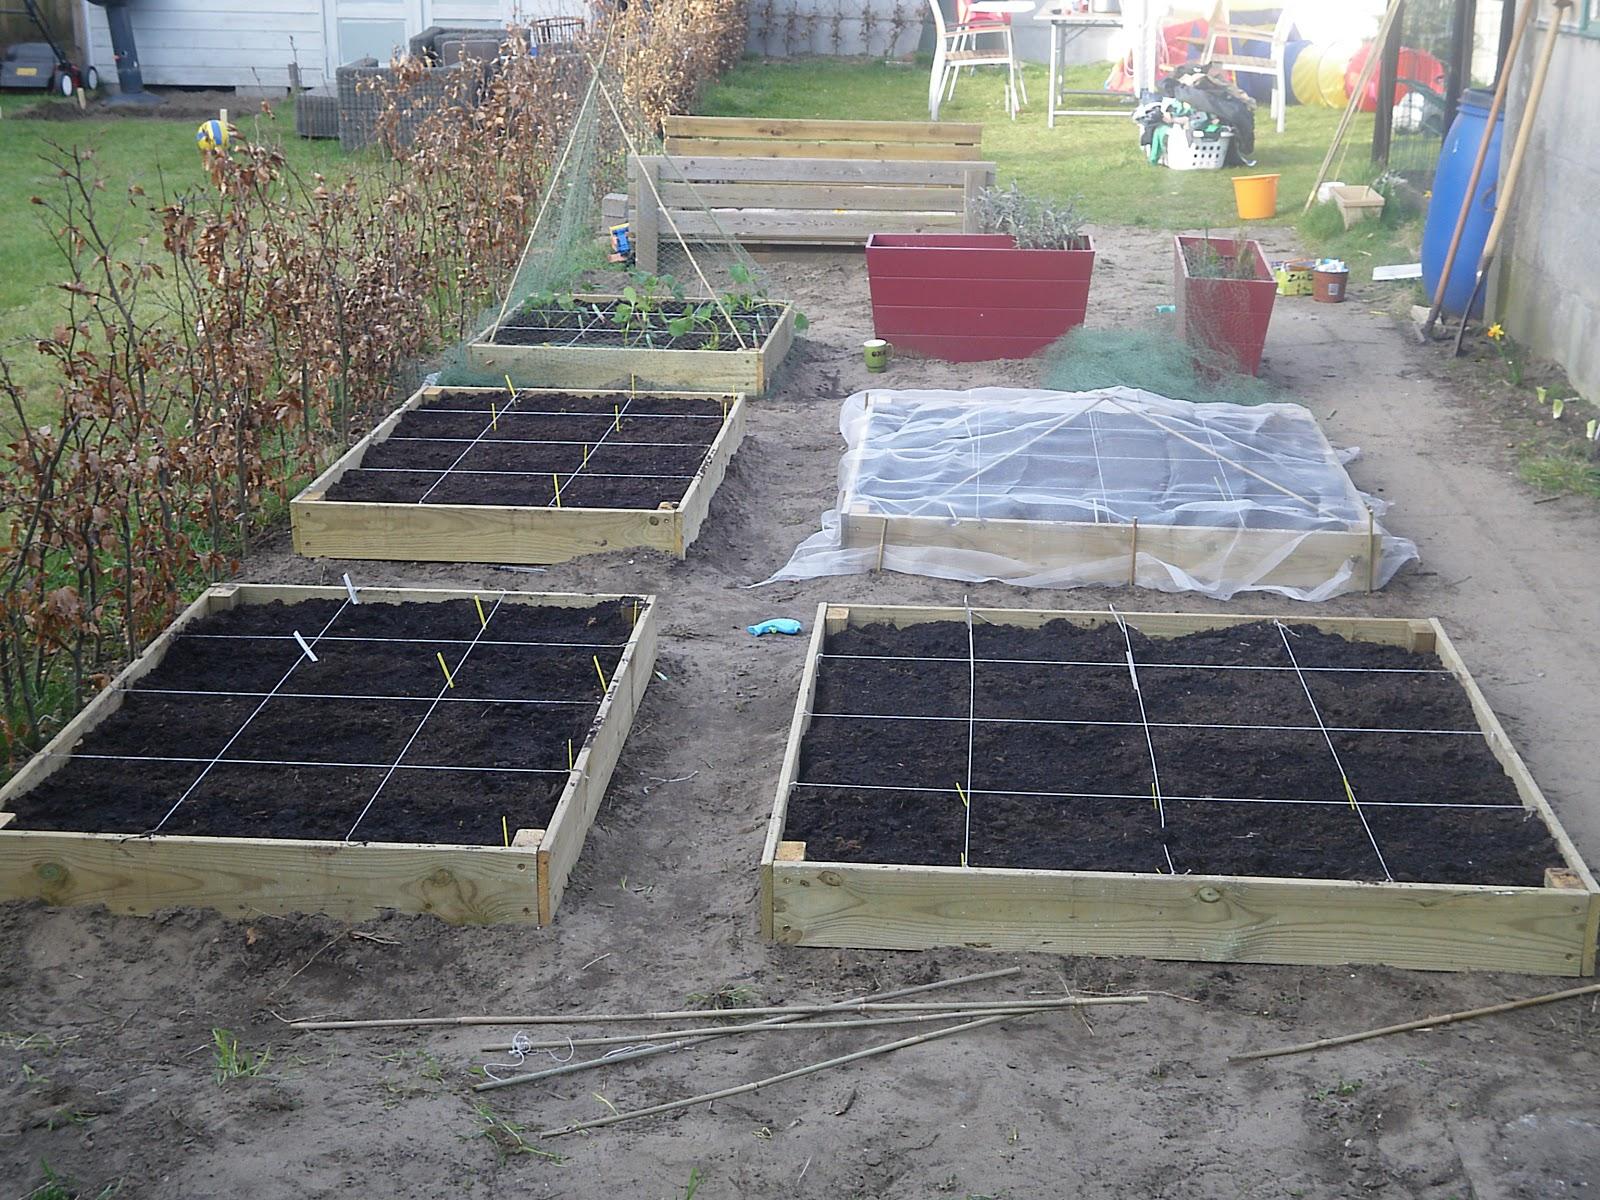 Vierkante Meter Tuin : De lekkerste groenten kweek je in je eigen moestuin horta